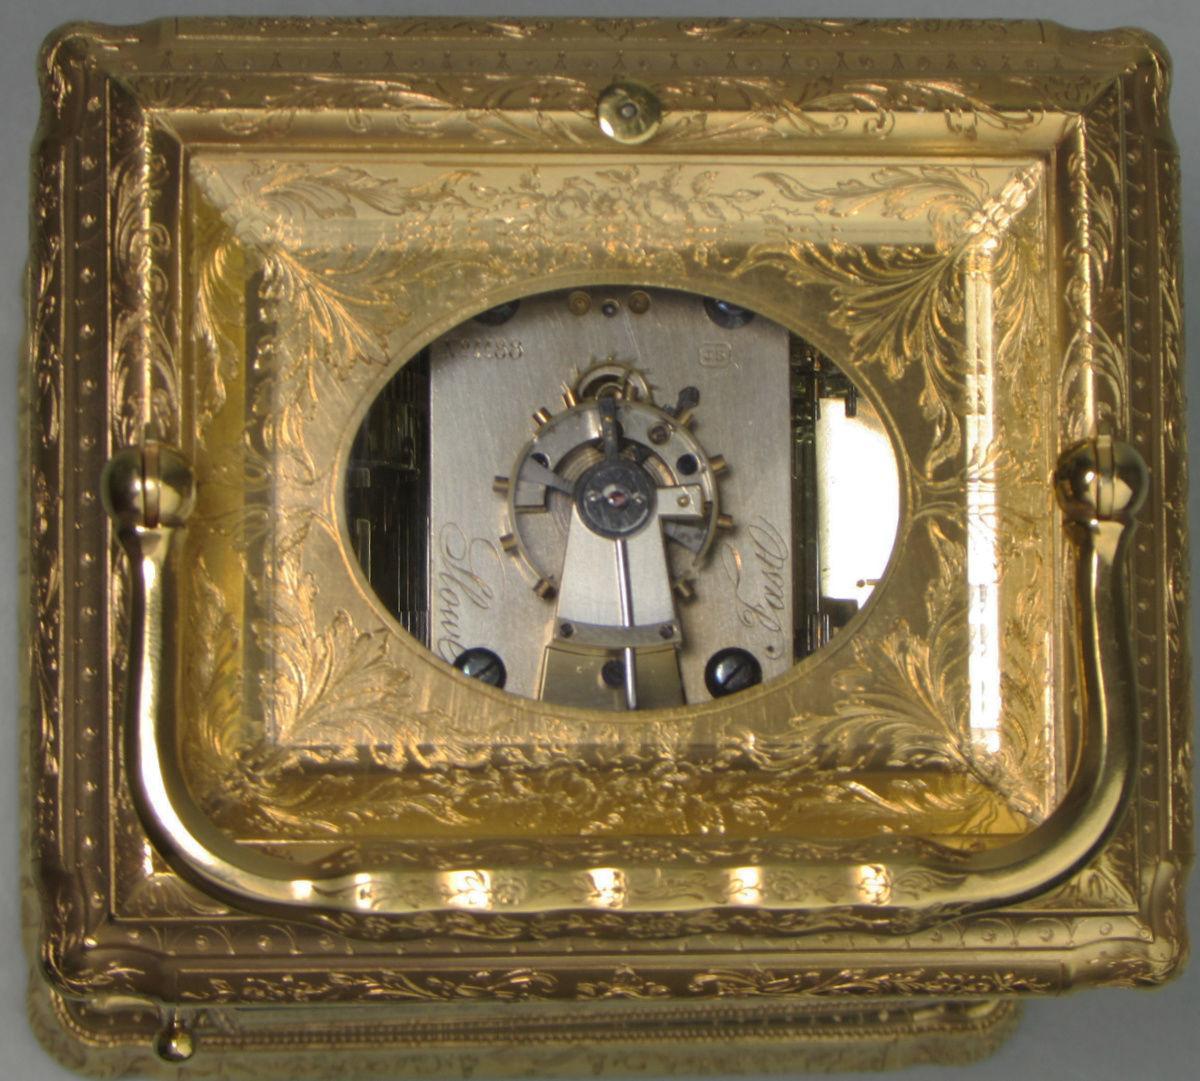 Soldano engraved gorge carriage clock escapement